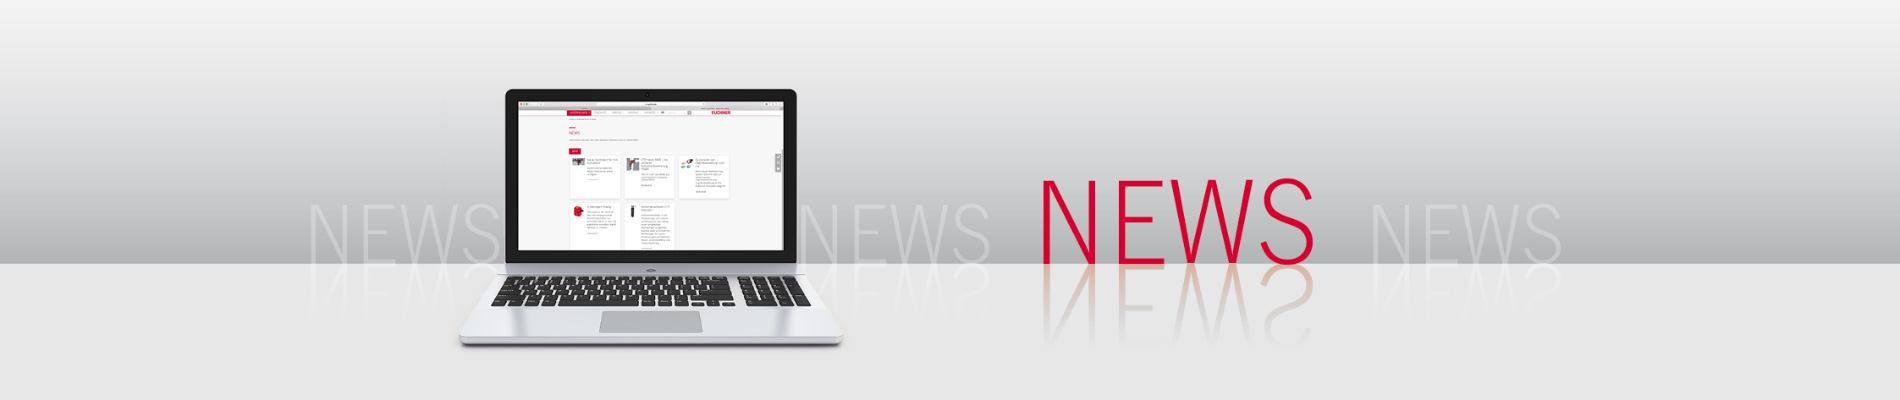 News Details